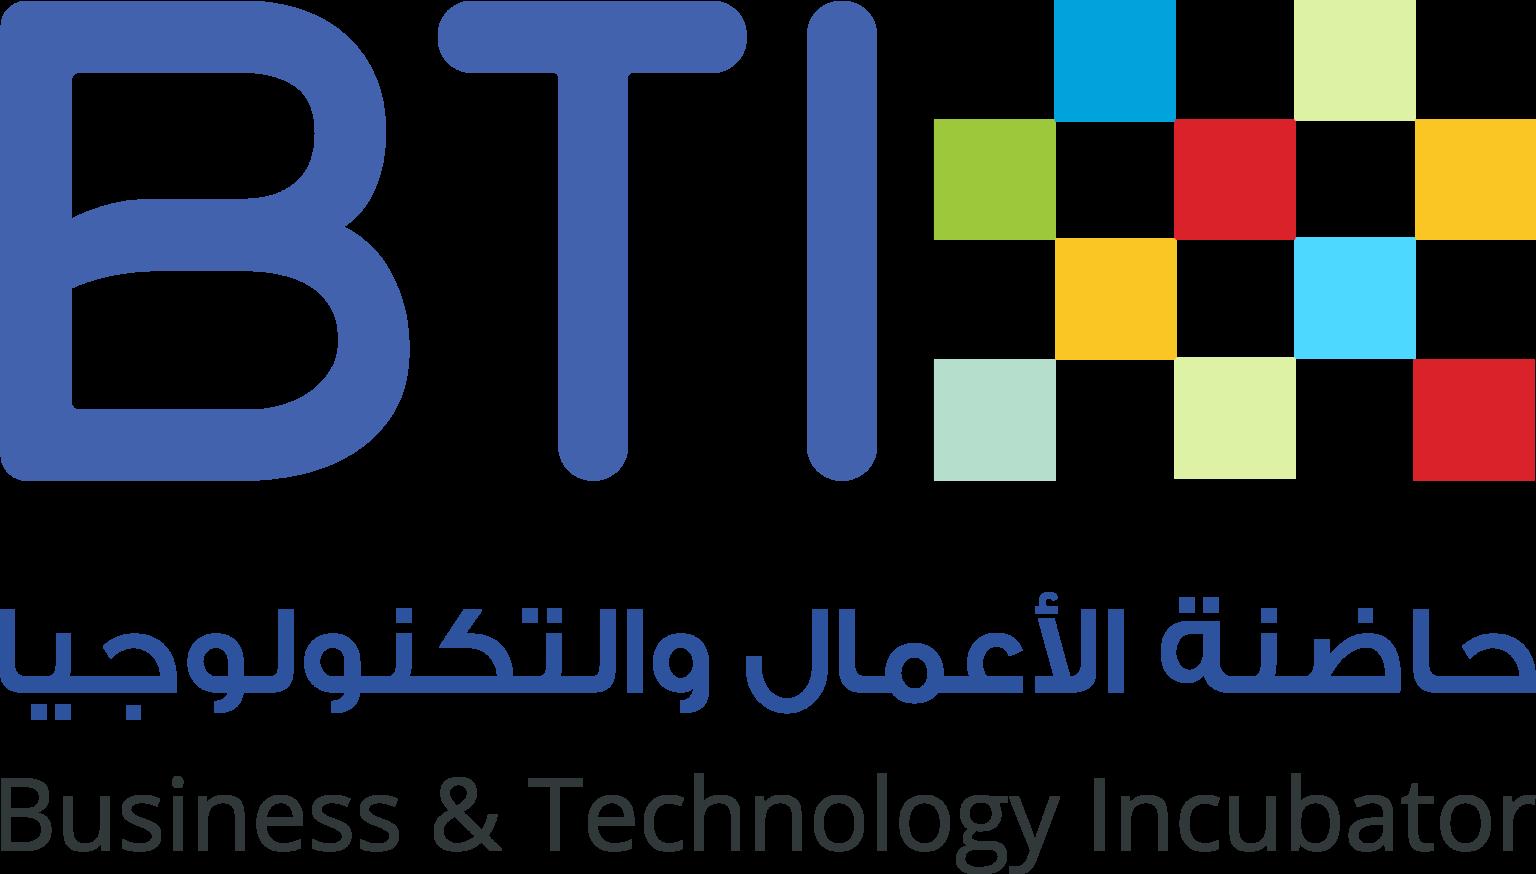 BTI-Logo-1536x874